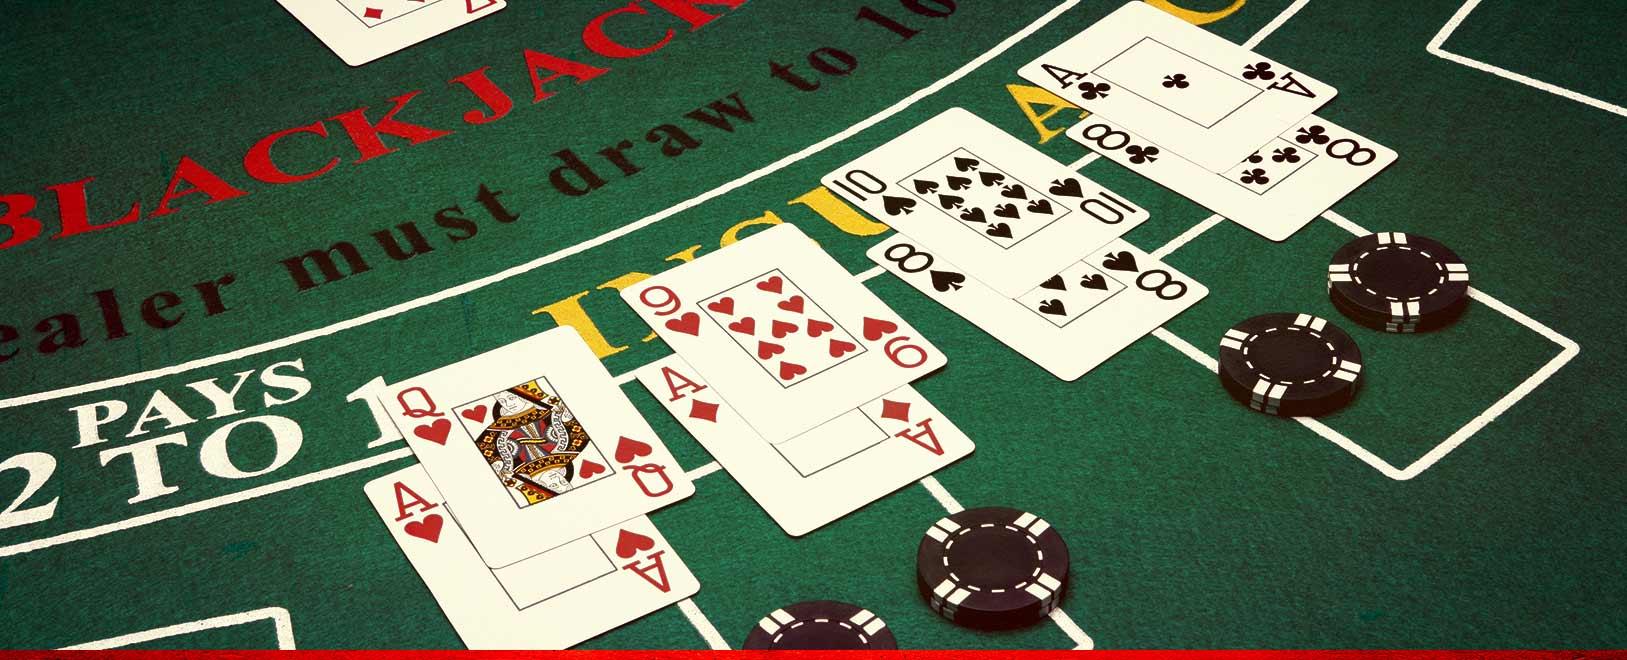 Top 10 Blackjack Tips to Win